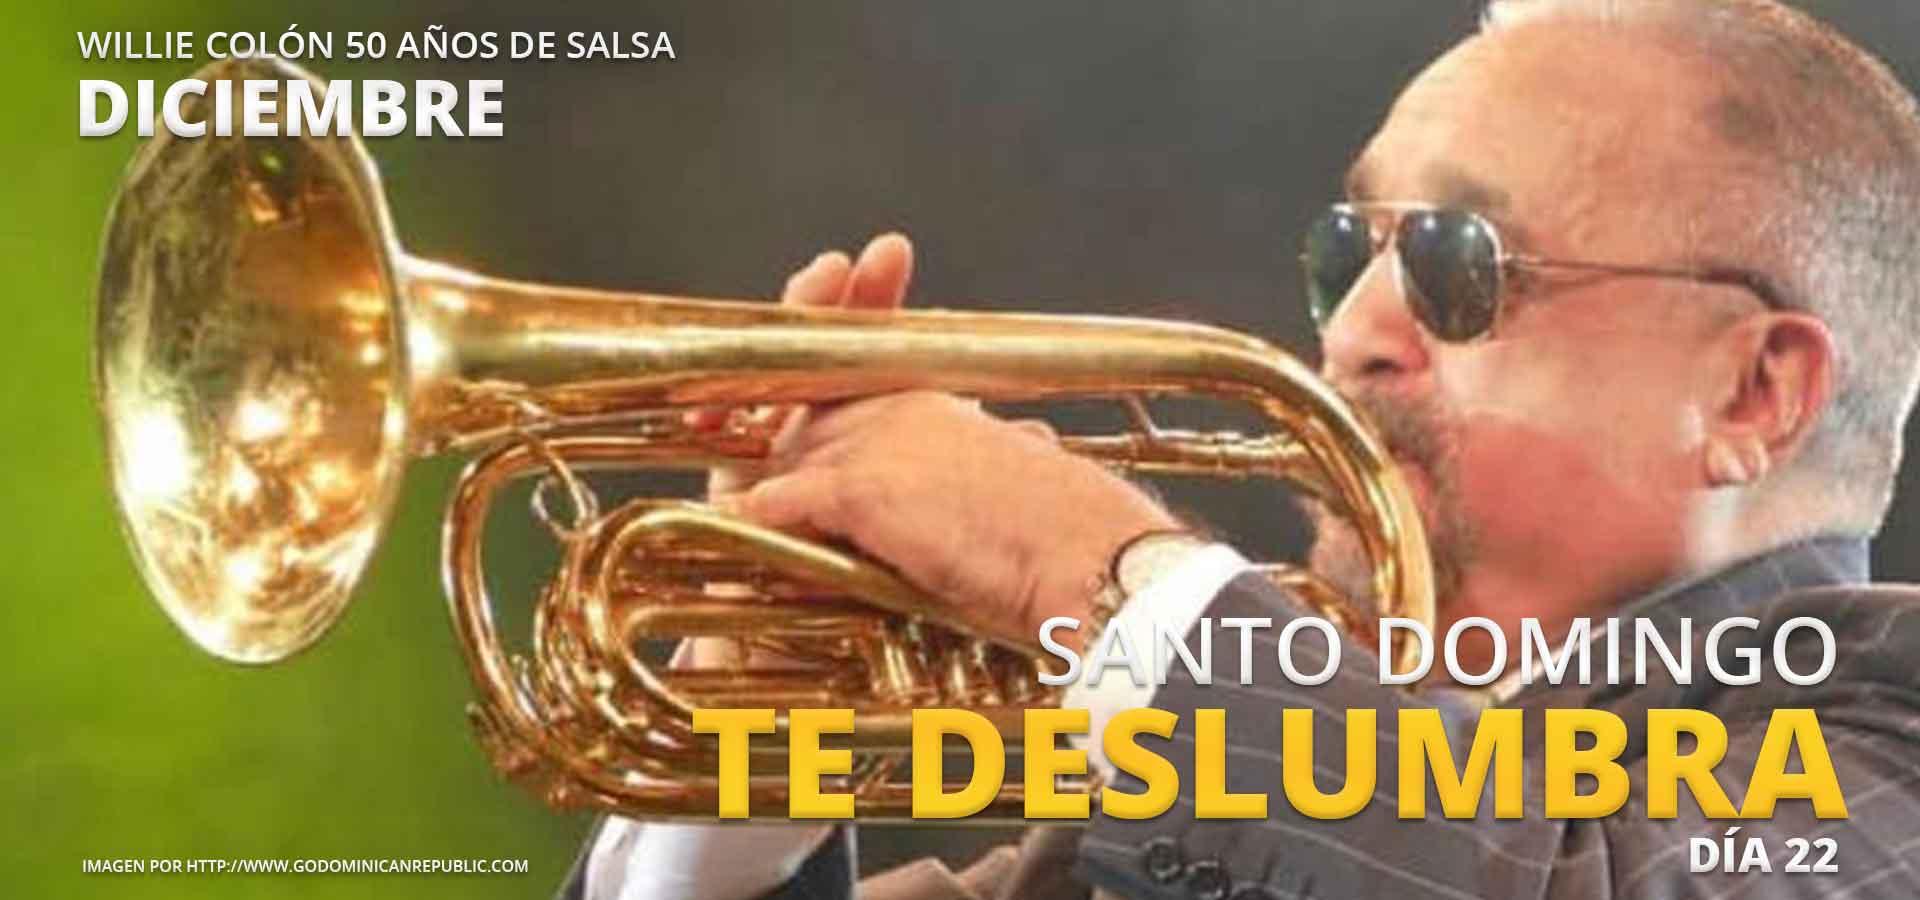 Willie Colon Salsa Santo Domingo